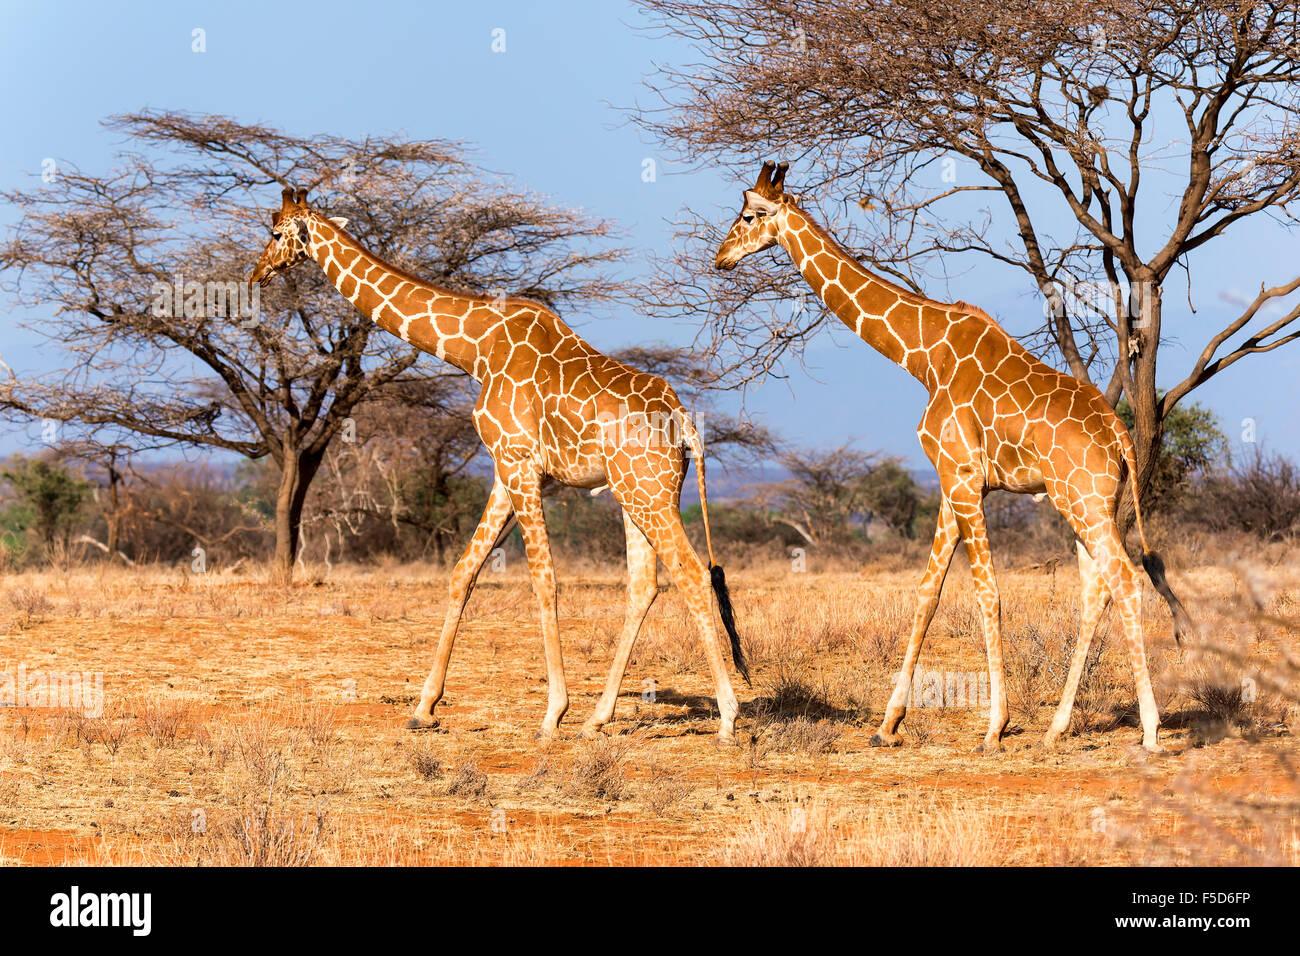 Reticulated giraffes or Somali giraffes (Giraffa reticulata camelopardalis) walking past acacia (Acacia sp.) trees - Stock Image